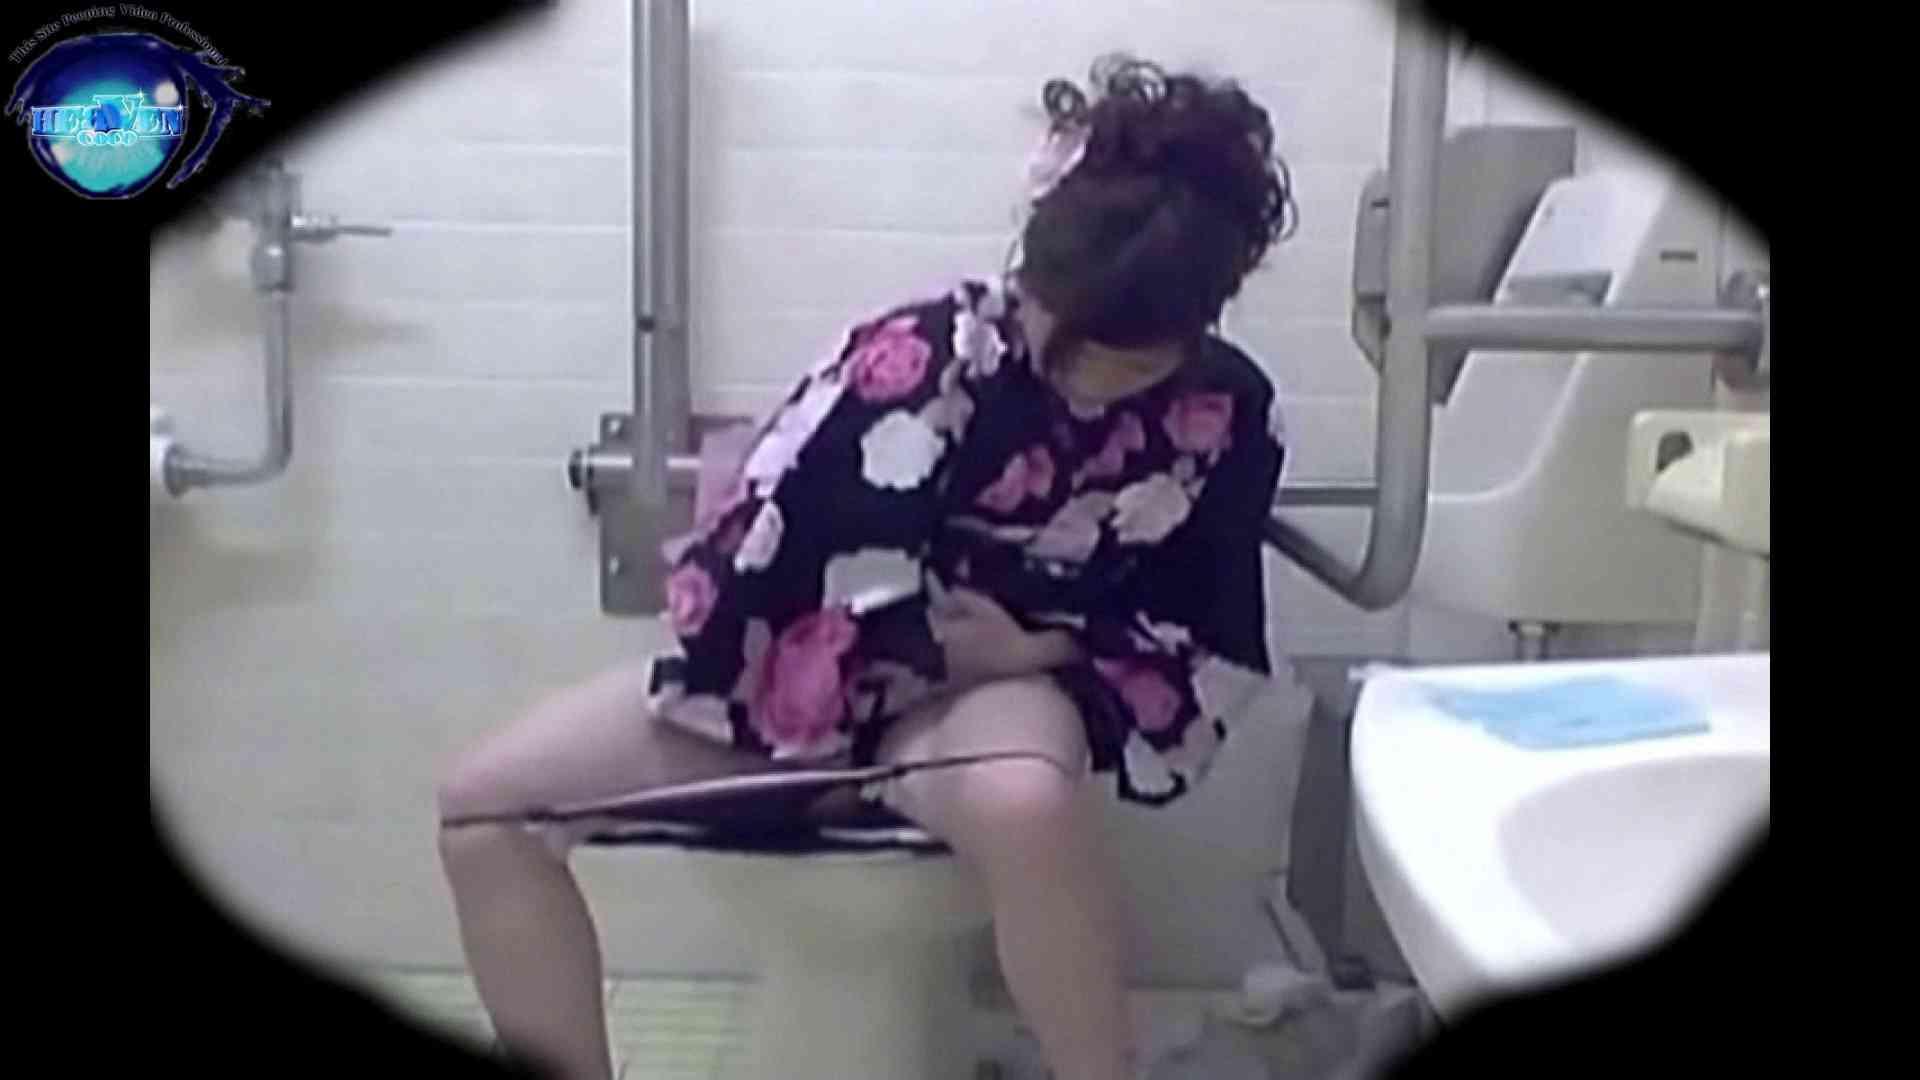 teen galトイレ覗き紙がナイ編‼vol.17 トイレ流出 | 覗き  93連発 33